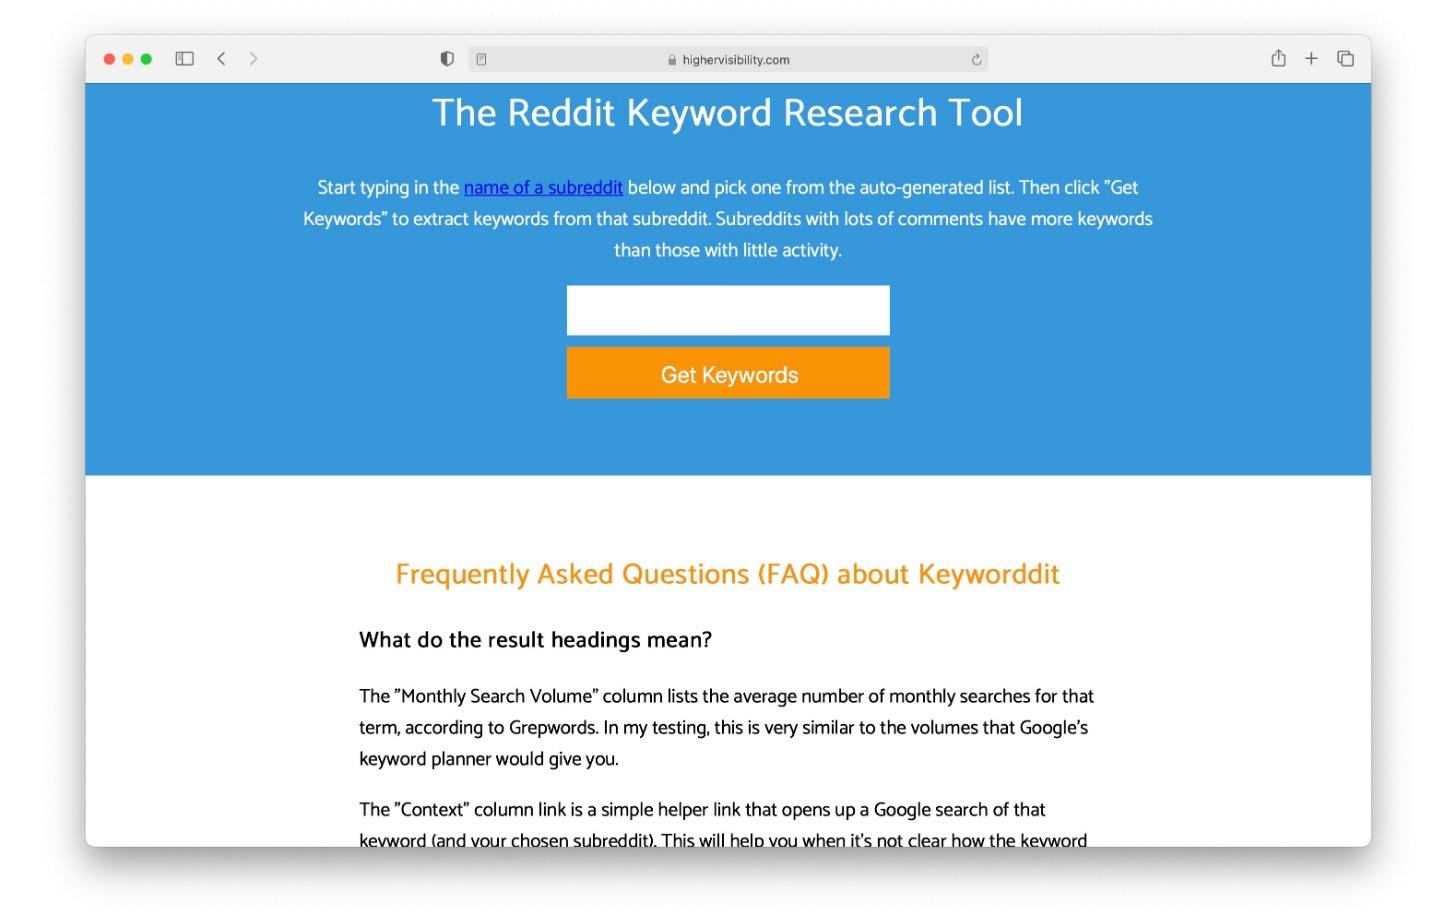 Keyworddit